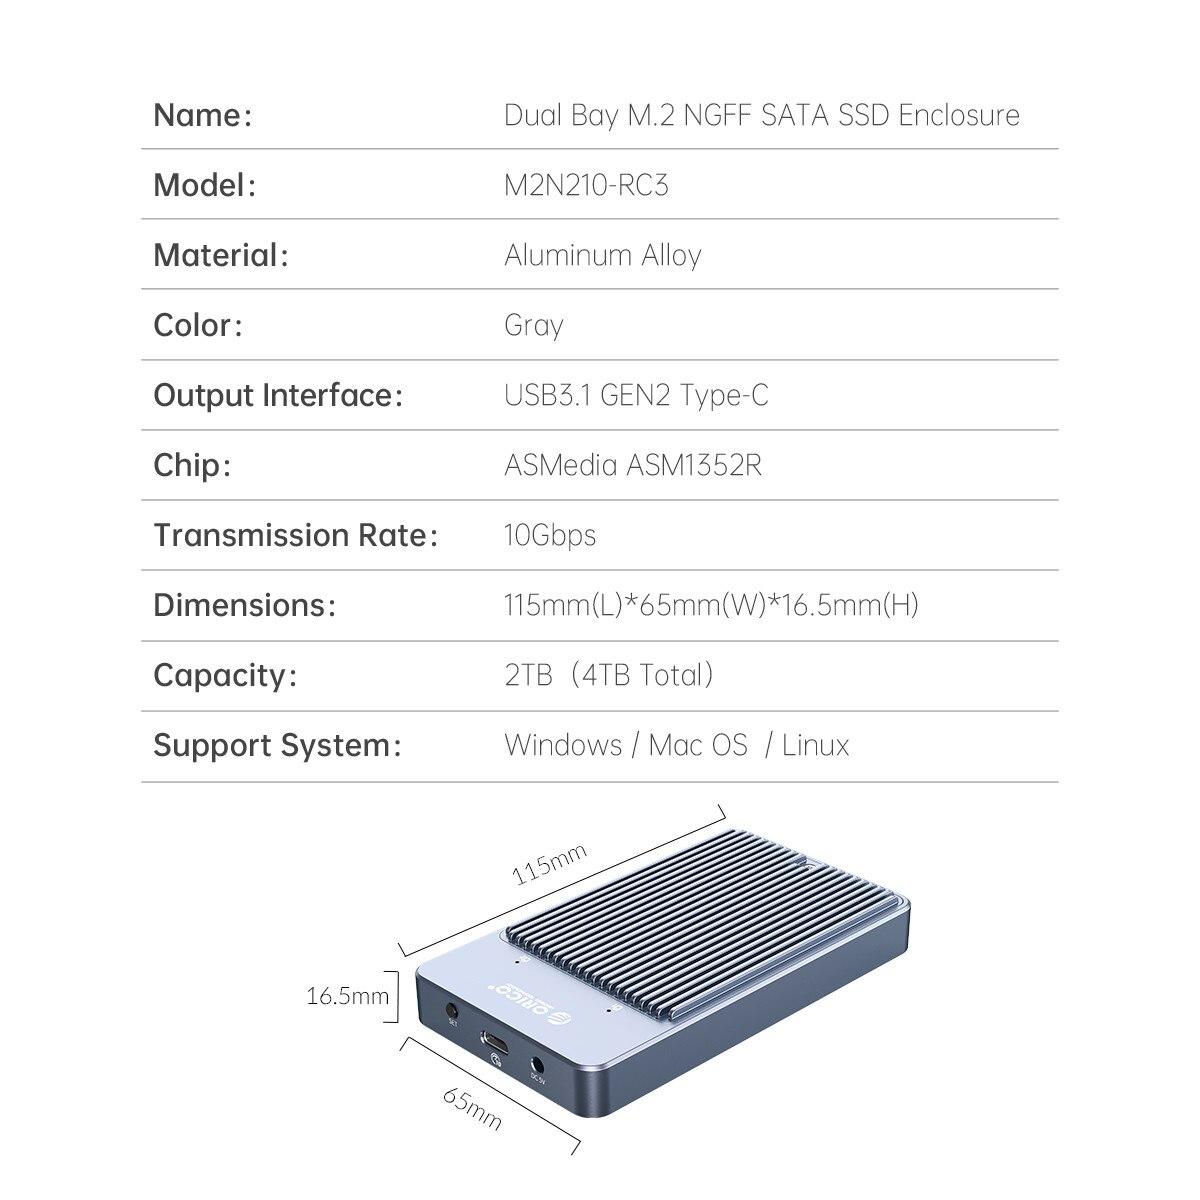 ORICO LSDT RAID Dual Bay M2 SSD Case Support M.2 NGFF SATA SSD Disk For B Key & B+M Key SSD Support PM/RAID 0/RAID 1/JBOD Mode enlarge